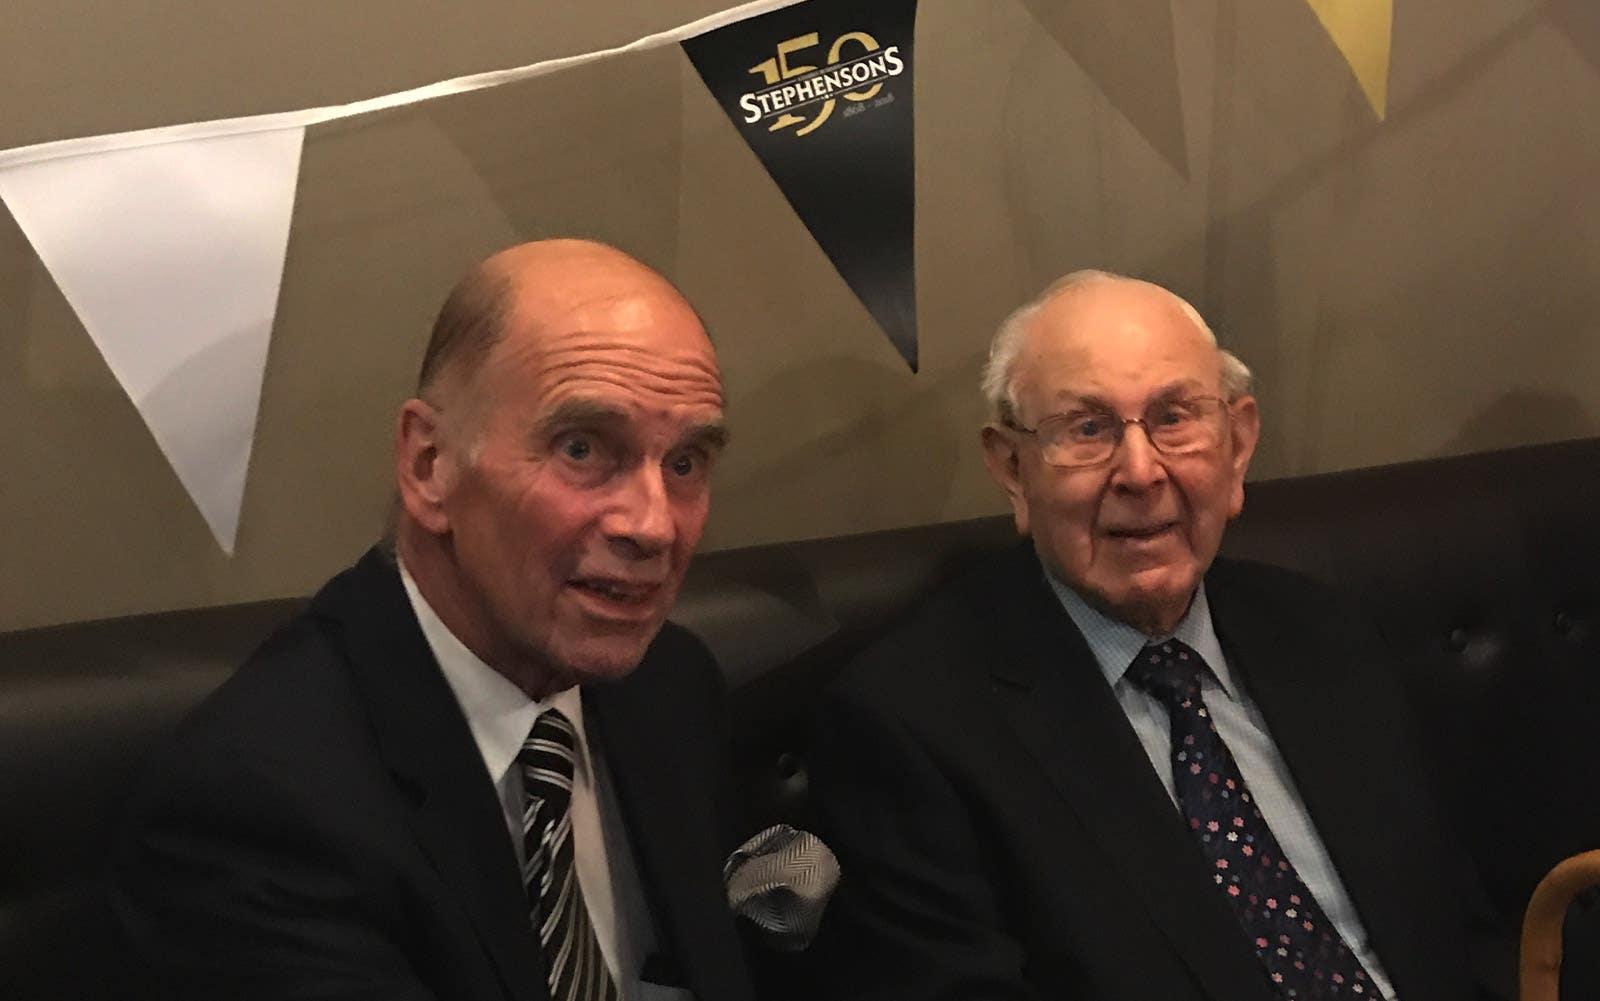 Michael Stephenson and John Milnes